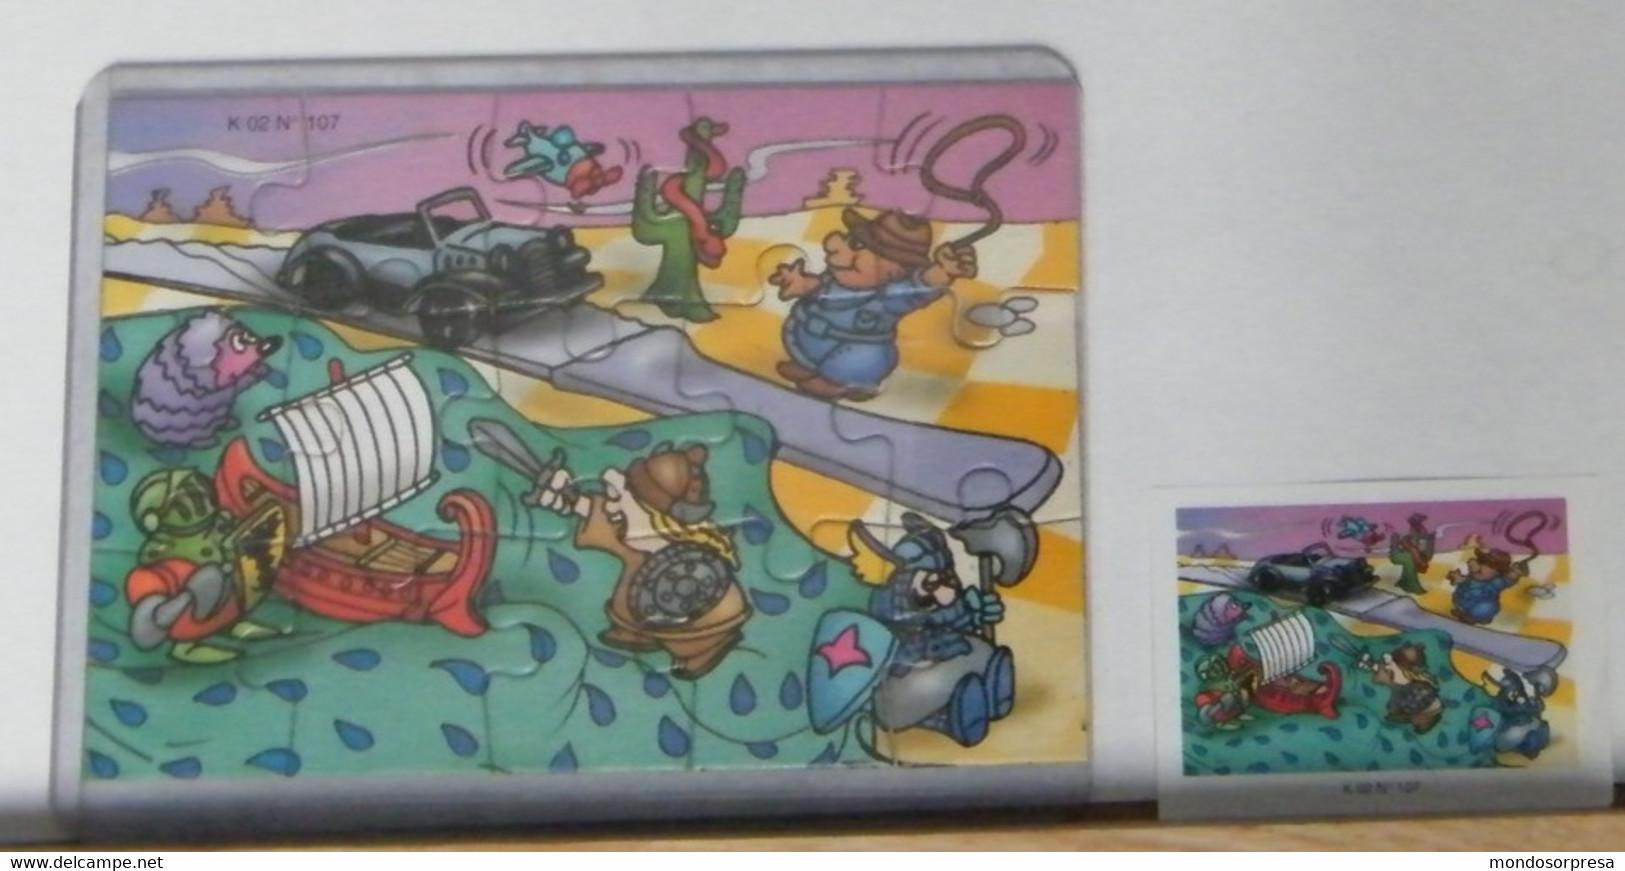 MONDOSORPRESA - PUZZLE FERRERO, FIGURATIVO K 02 N° 107 + CARTINA - Puzzles